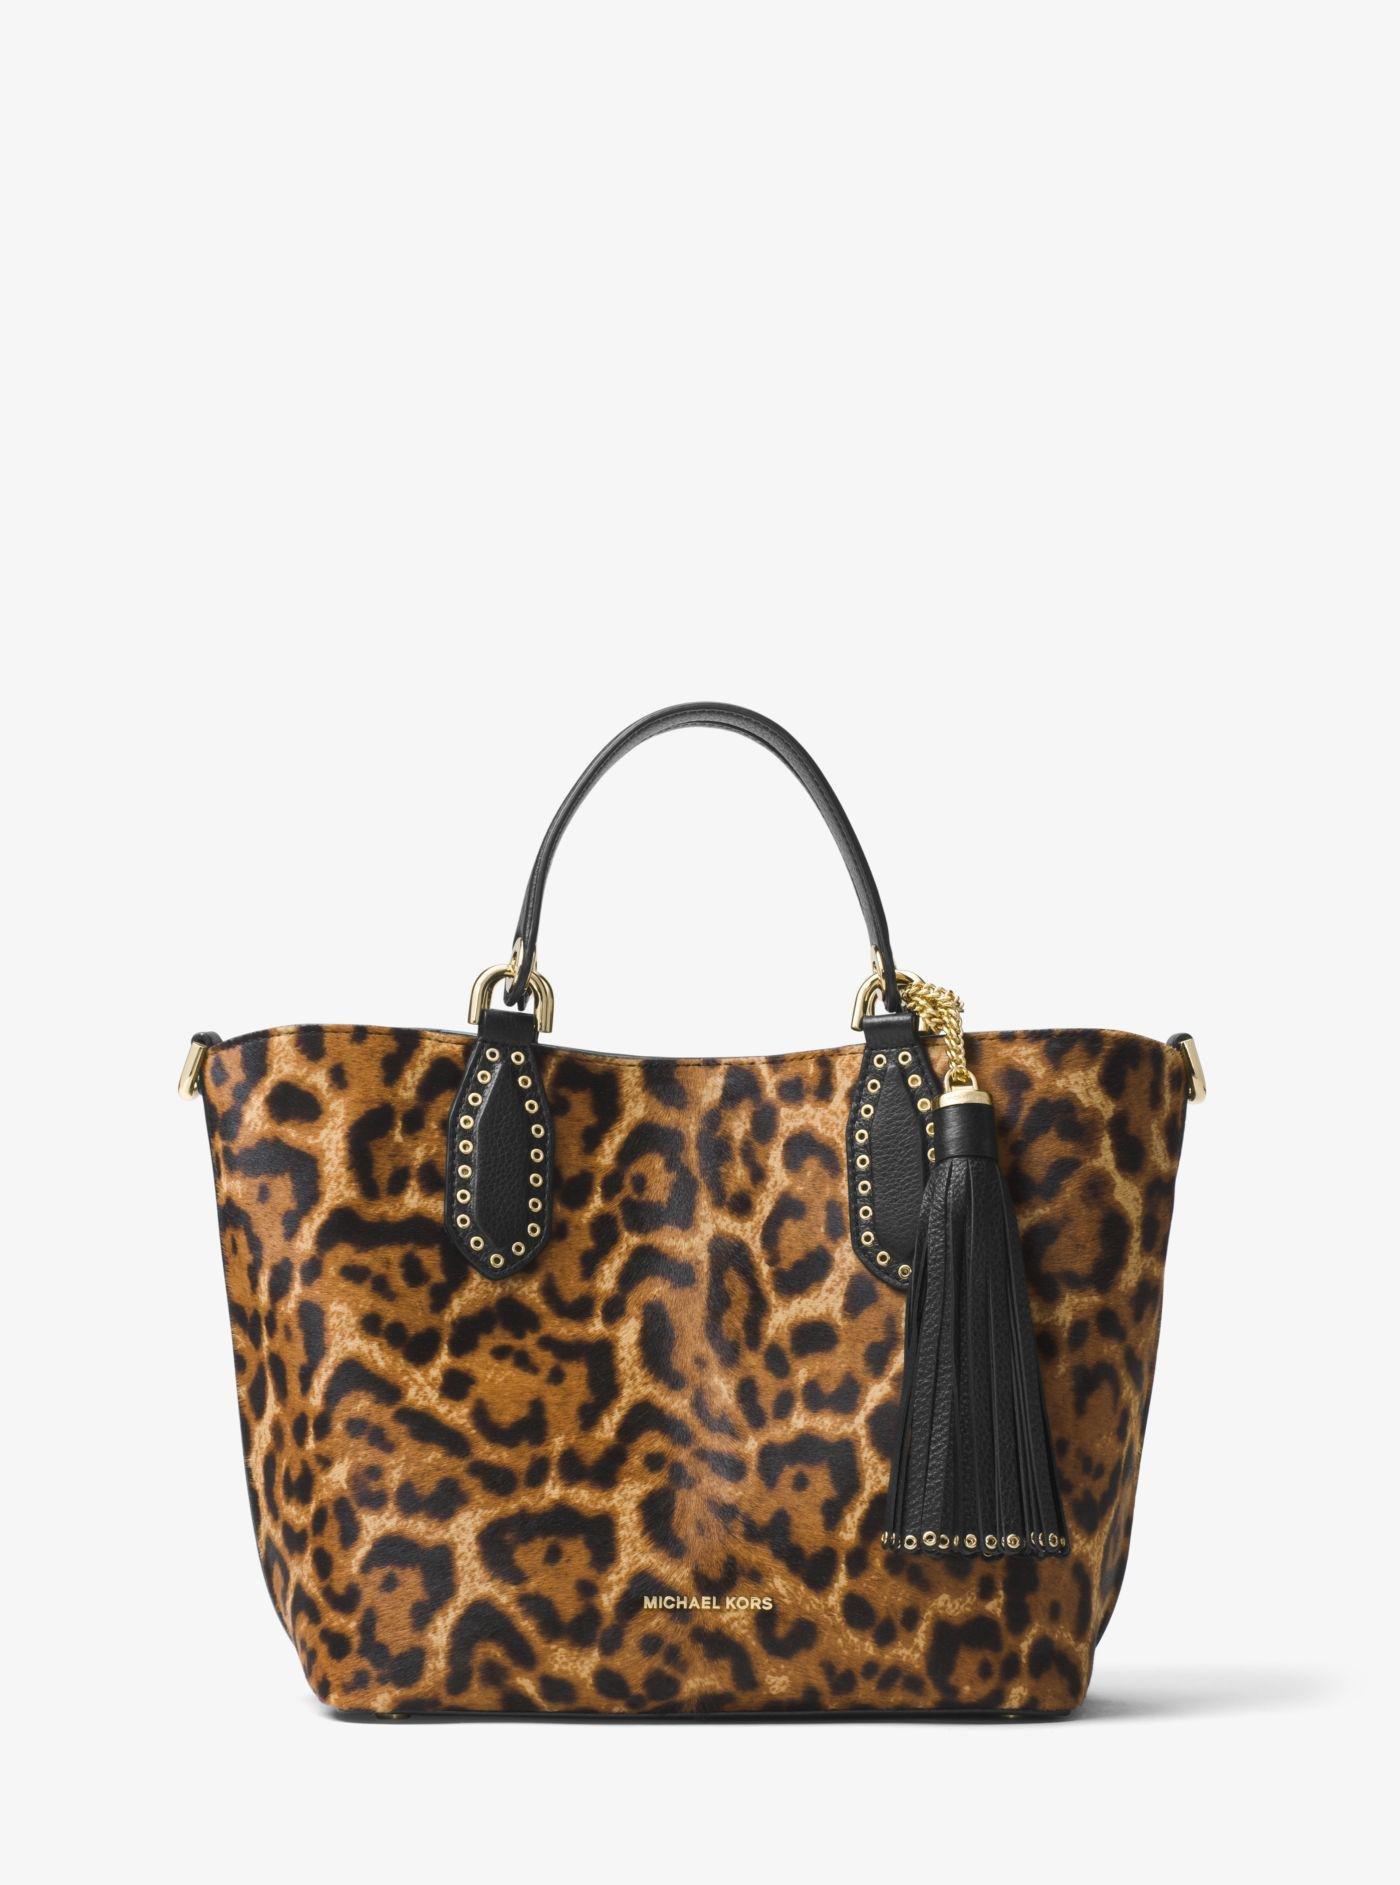 8e86a522ee69 Lyst - Michael Kors Brooklyn Leopard Calf Hair Tote